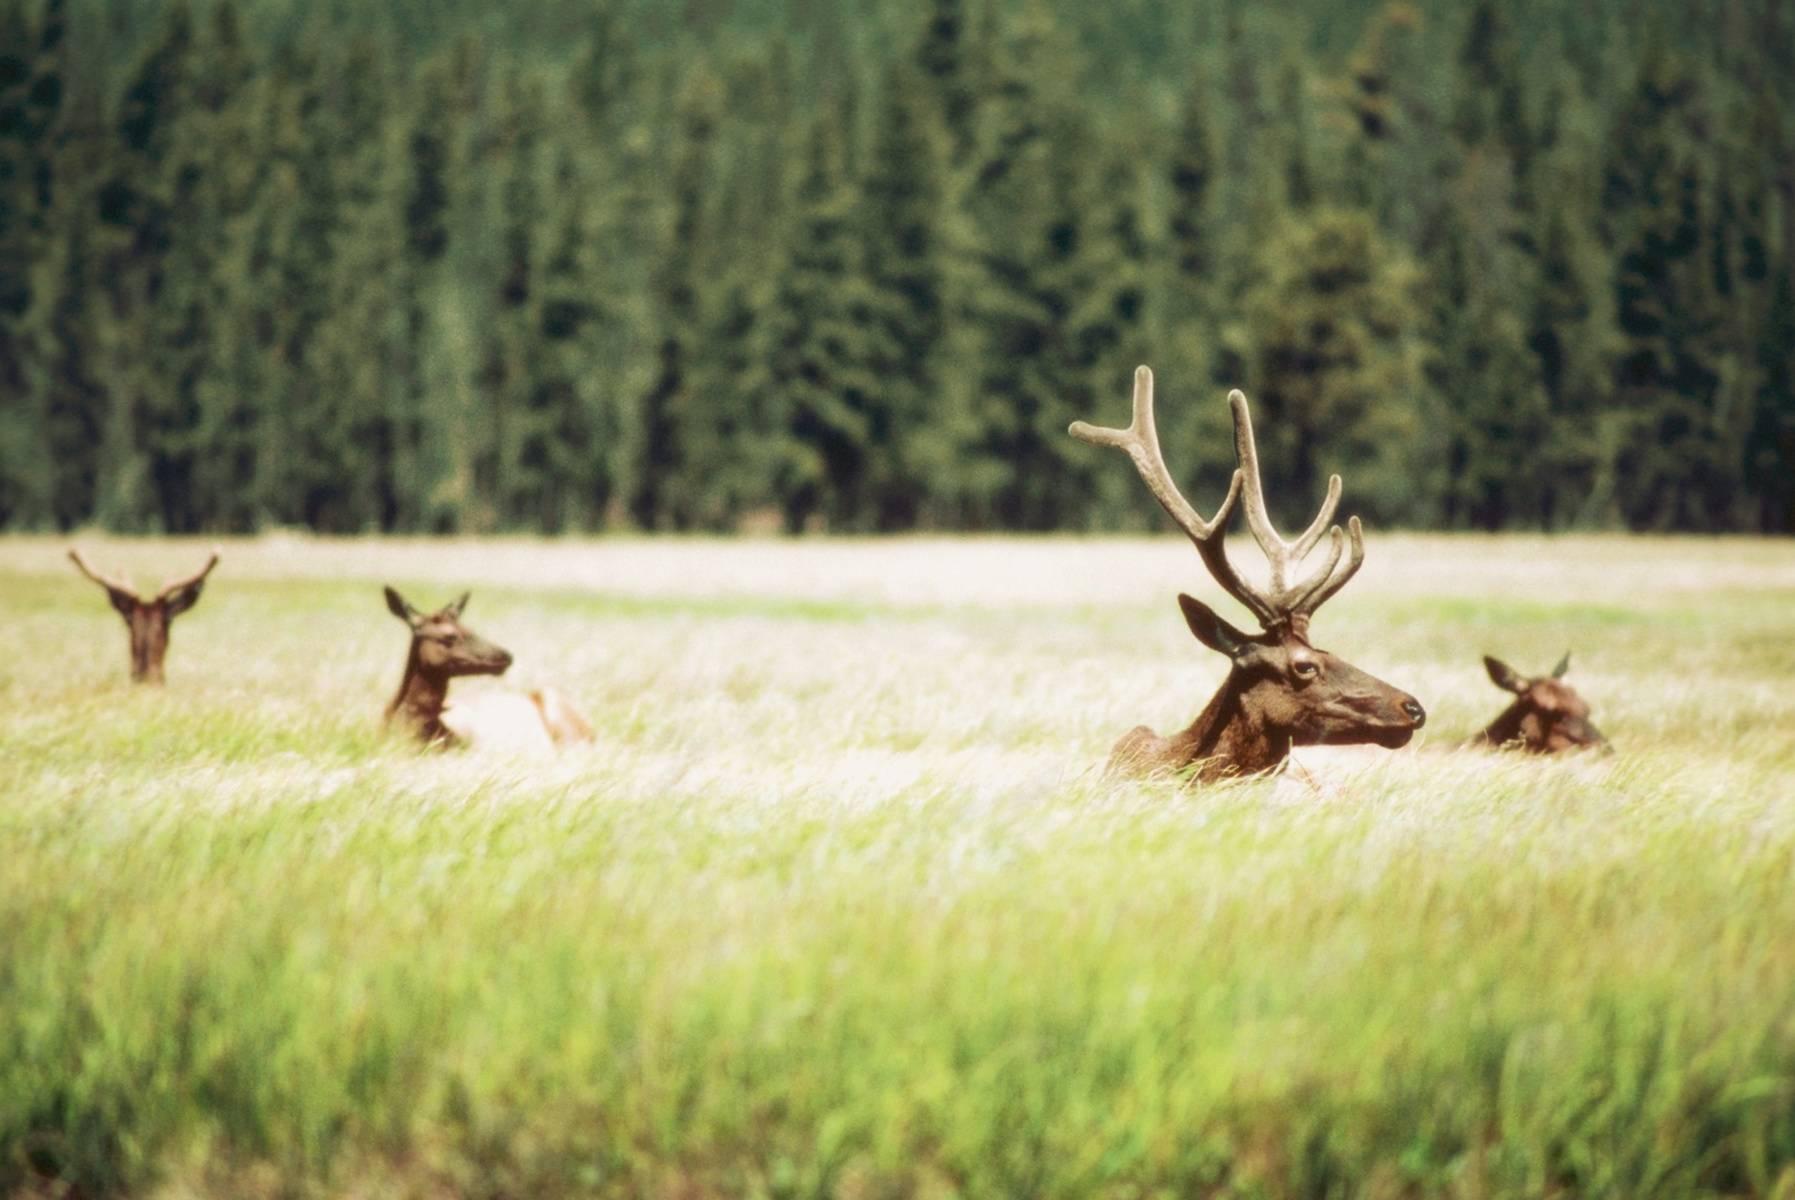 12-Day West Coast Highlights Tour: Shoshone Falls, Yellowstone Overnight & Grand Canyon